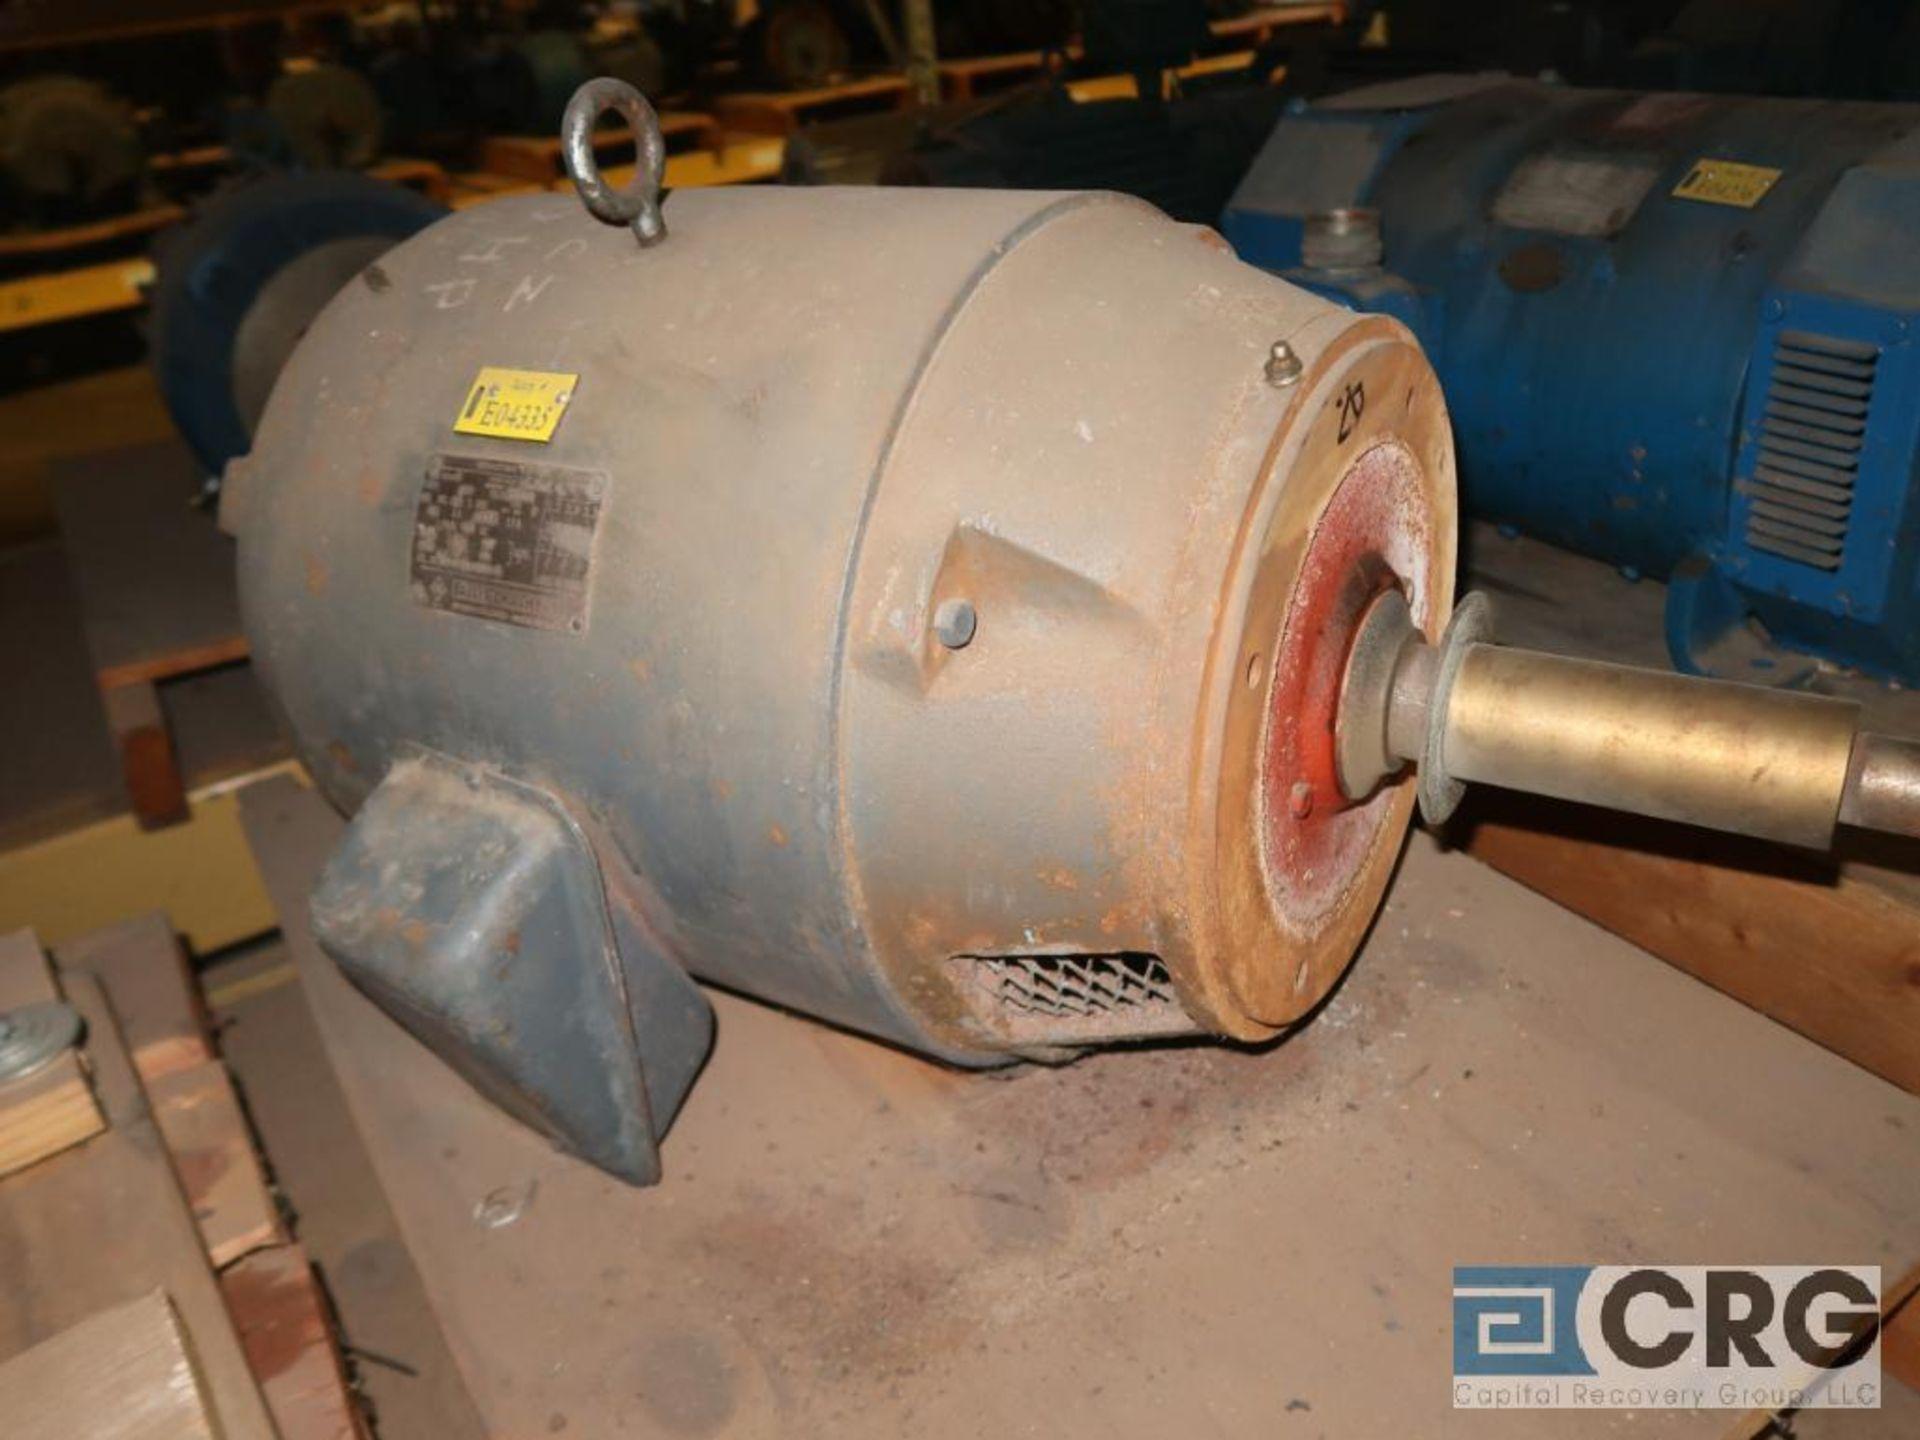 Lot of (4) assorted 20 HP motors (Motor Building) - Image 4 of 4